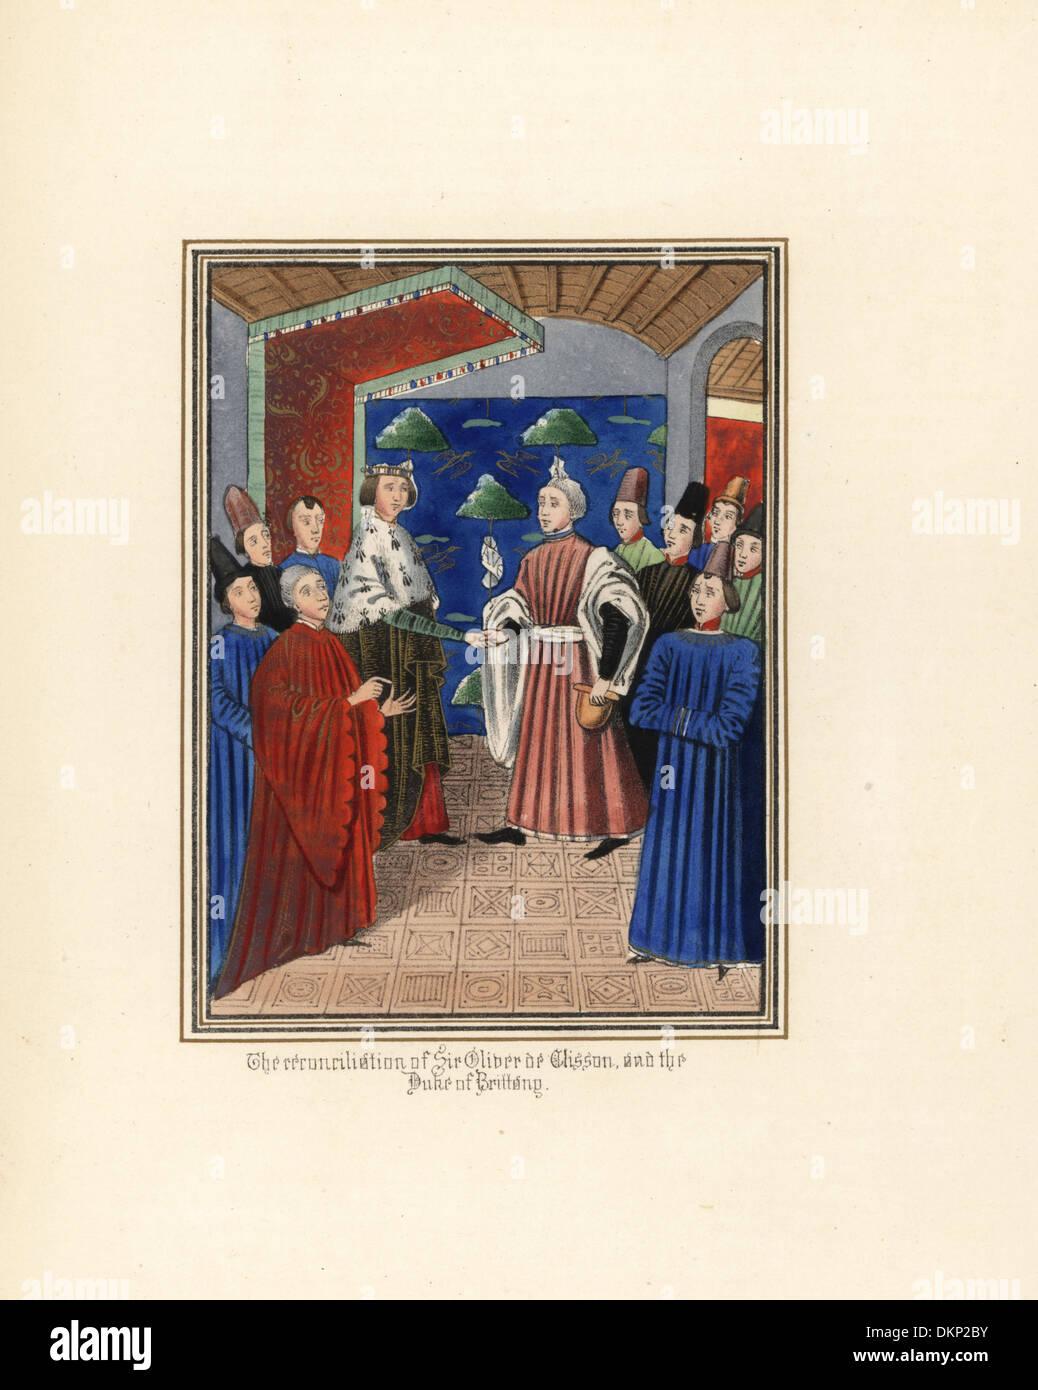 The reconciliation of Sir Oliver de Clisson and John de Montfort, 1397. - Stock Image